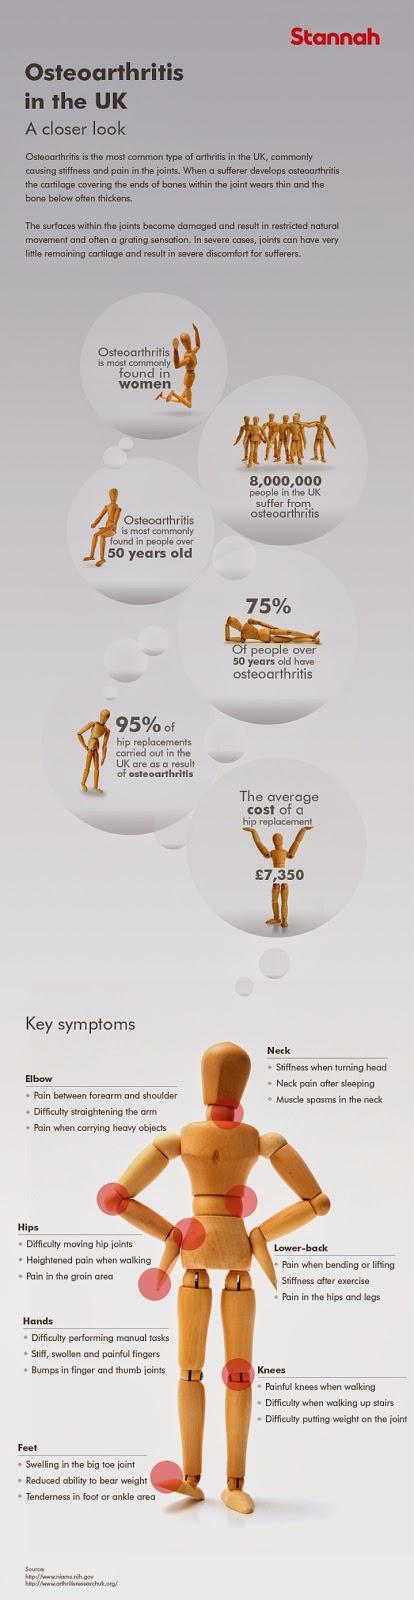 Osteoarthritis in the UK*